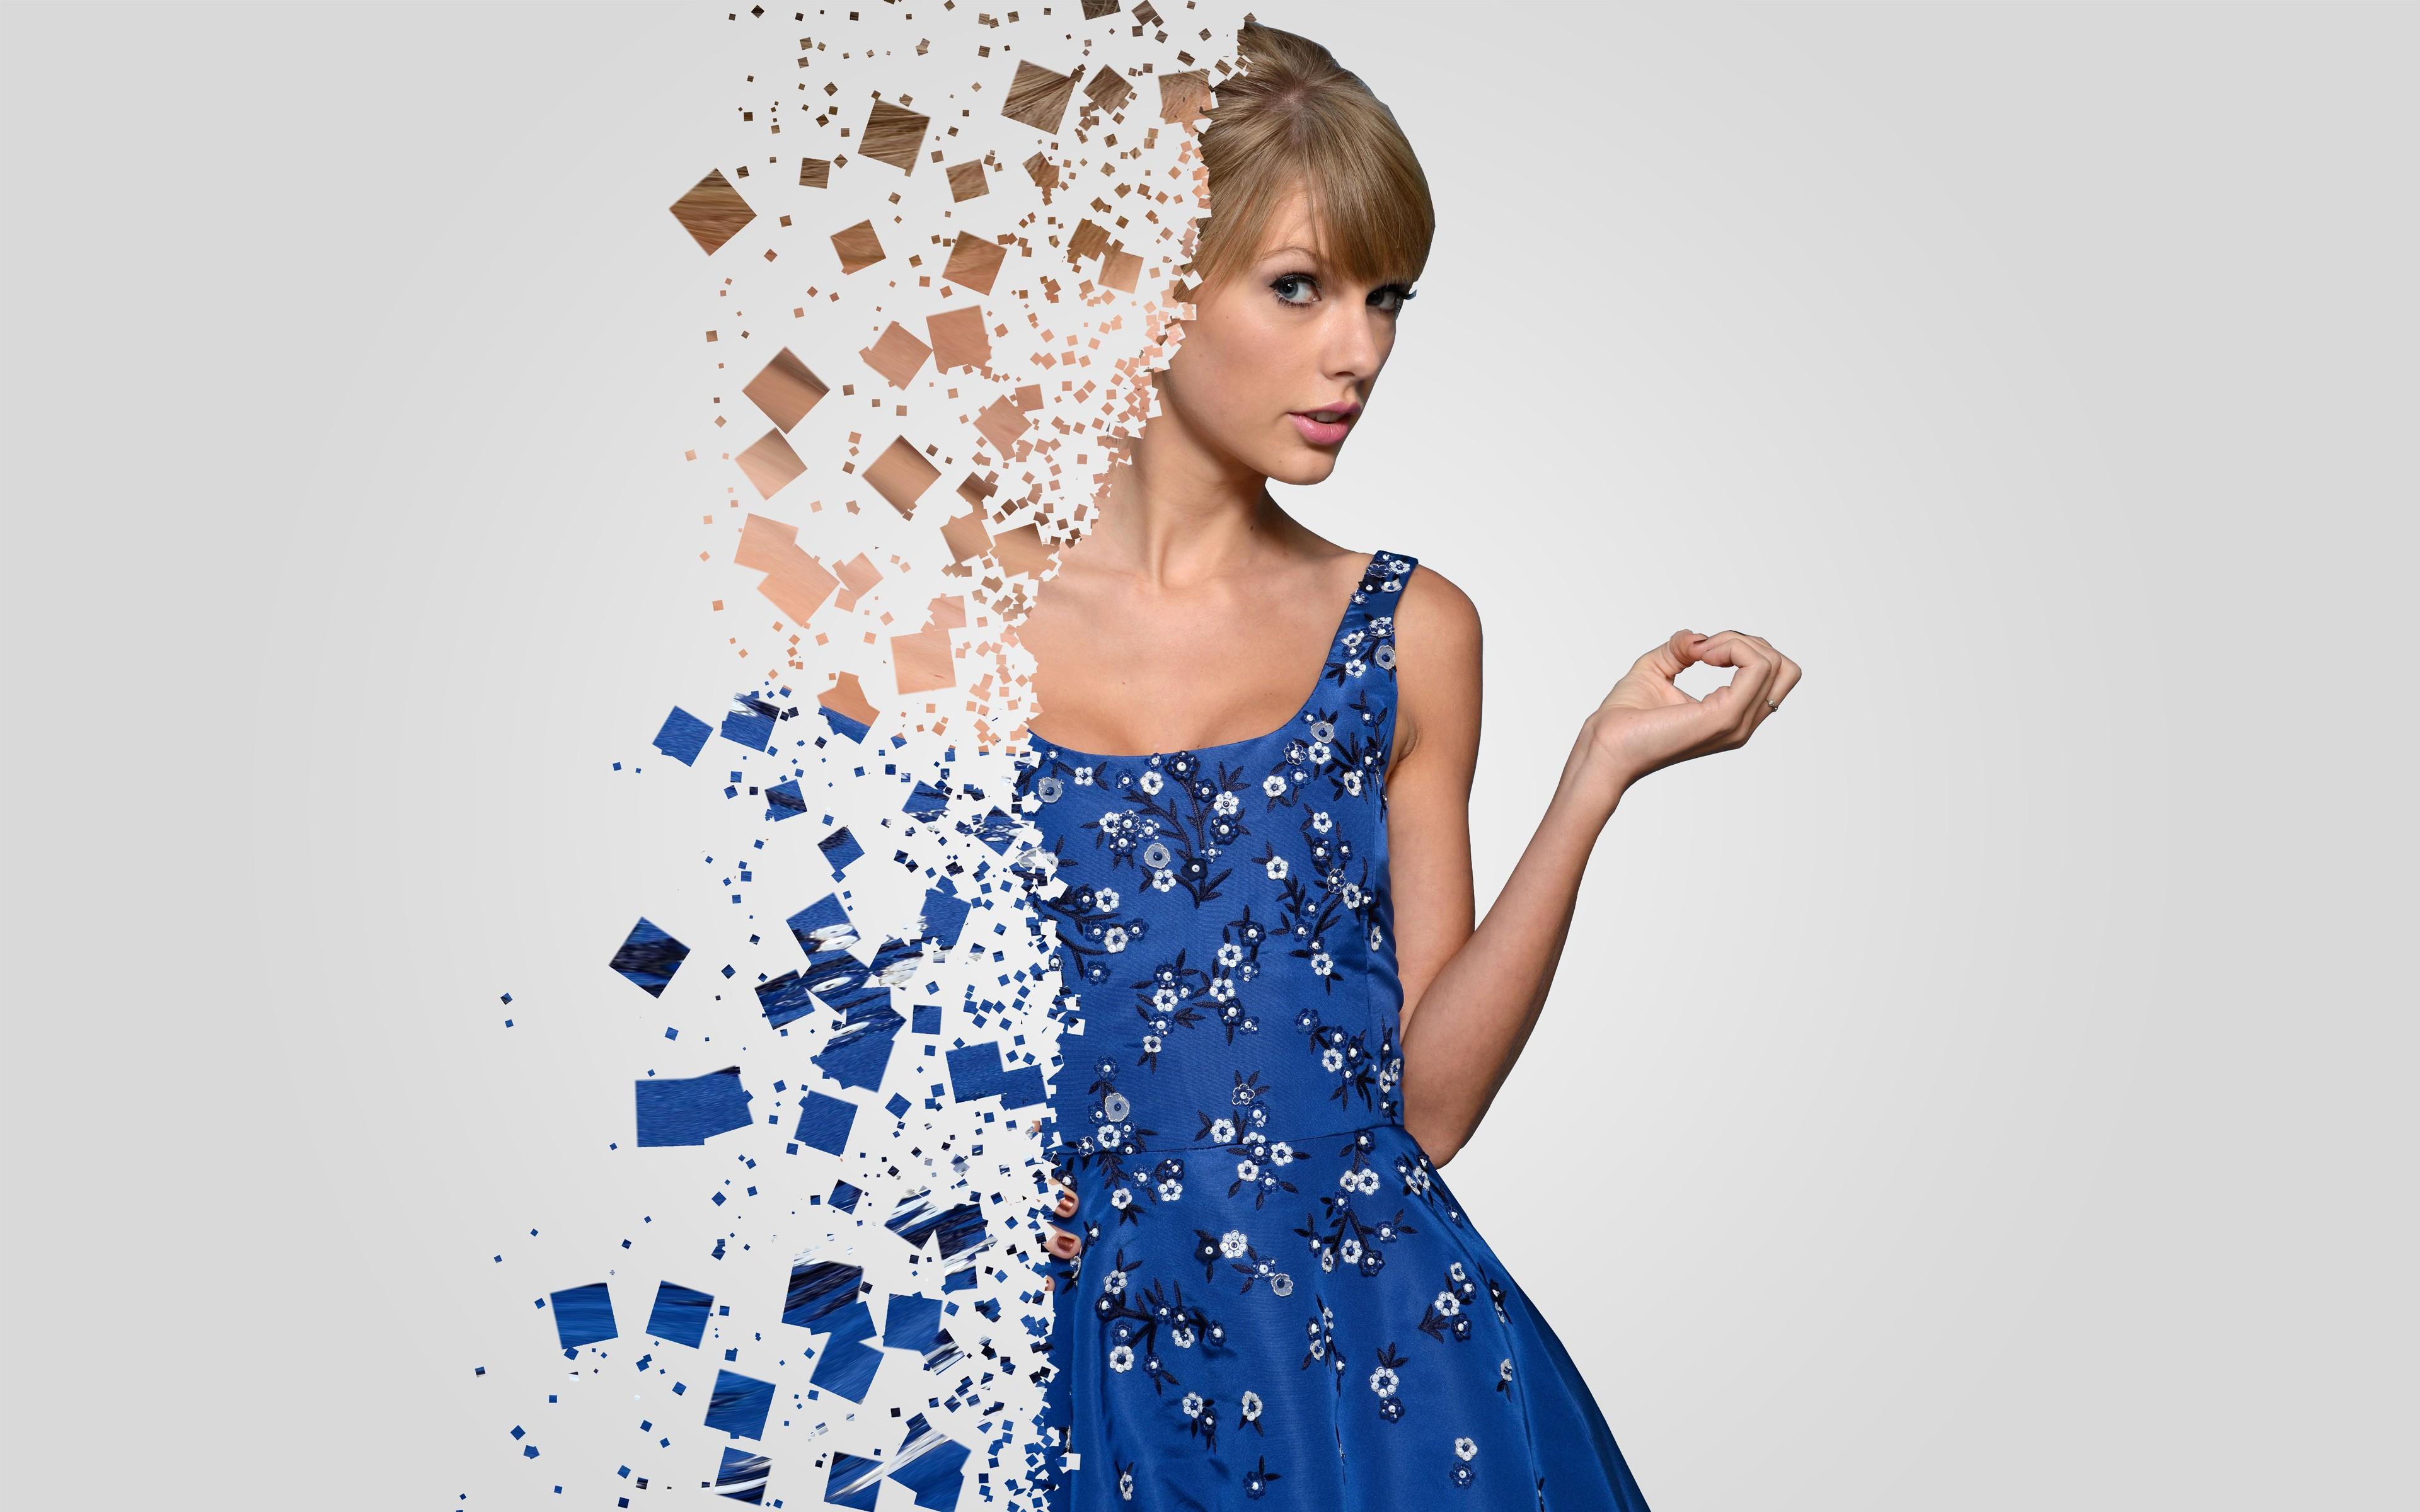 Hintergrundbilder : Frau, Kleid, blau, Muster, Taylor Swift, Mode ...